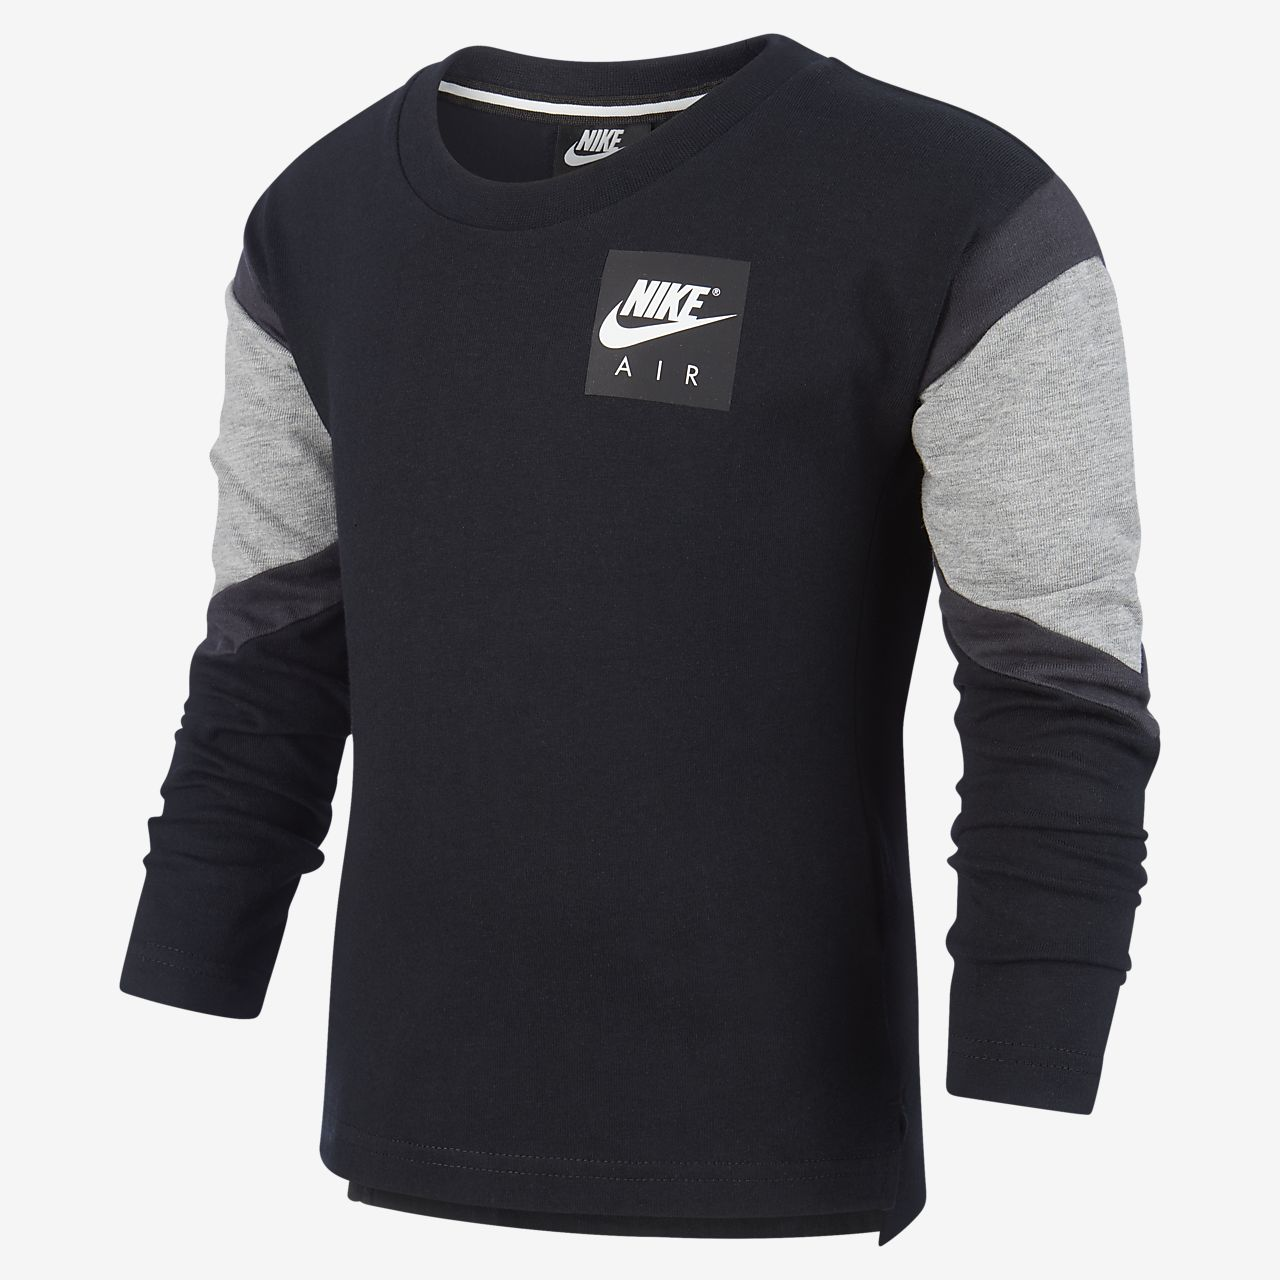 Långärmad tröja Nike Air för små barn. Nike SE